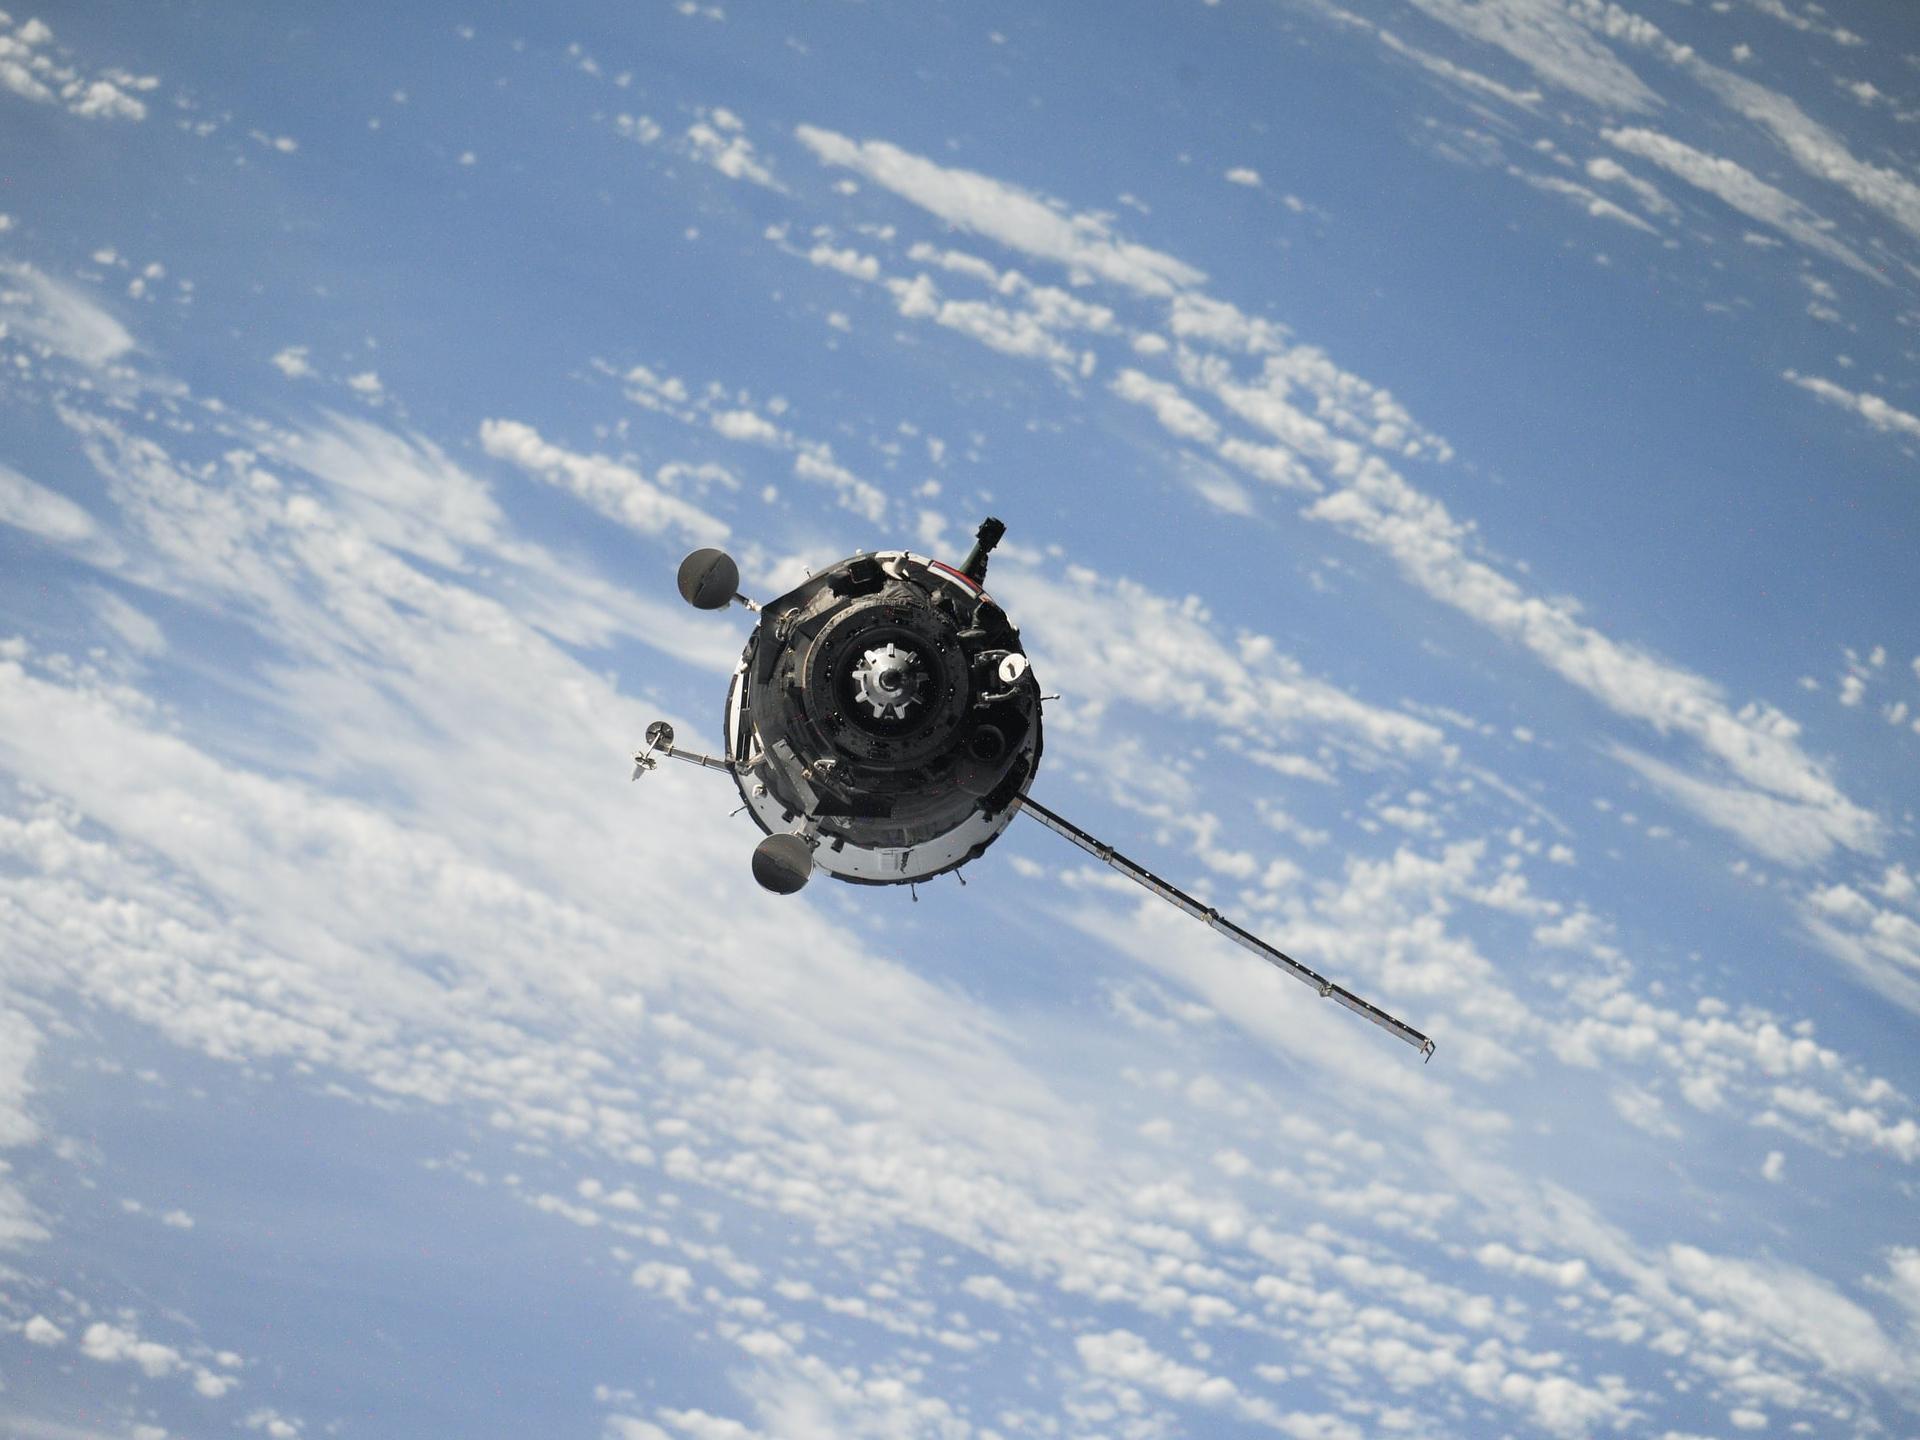 Image credit: NASA/Unsplash